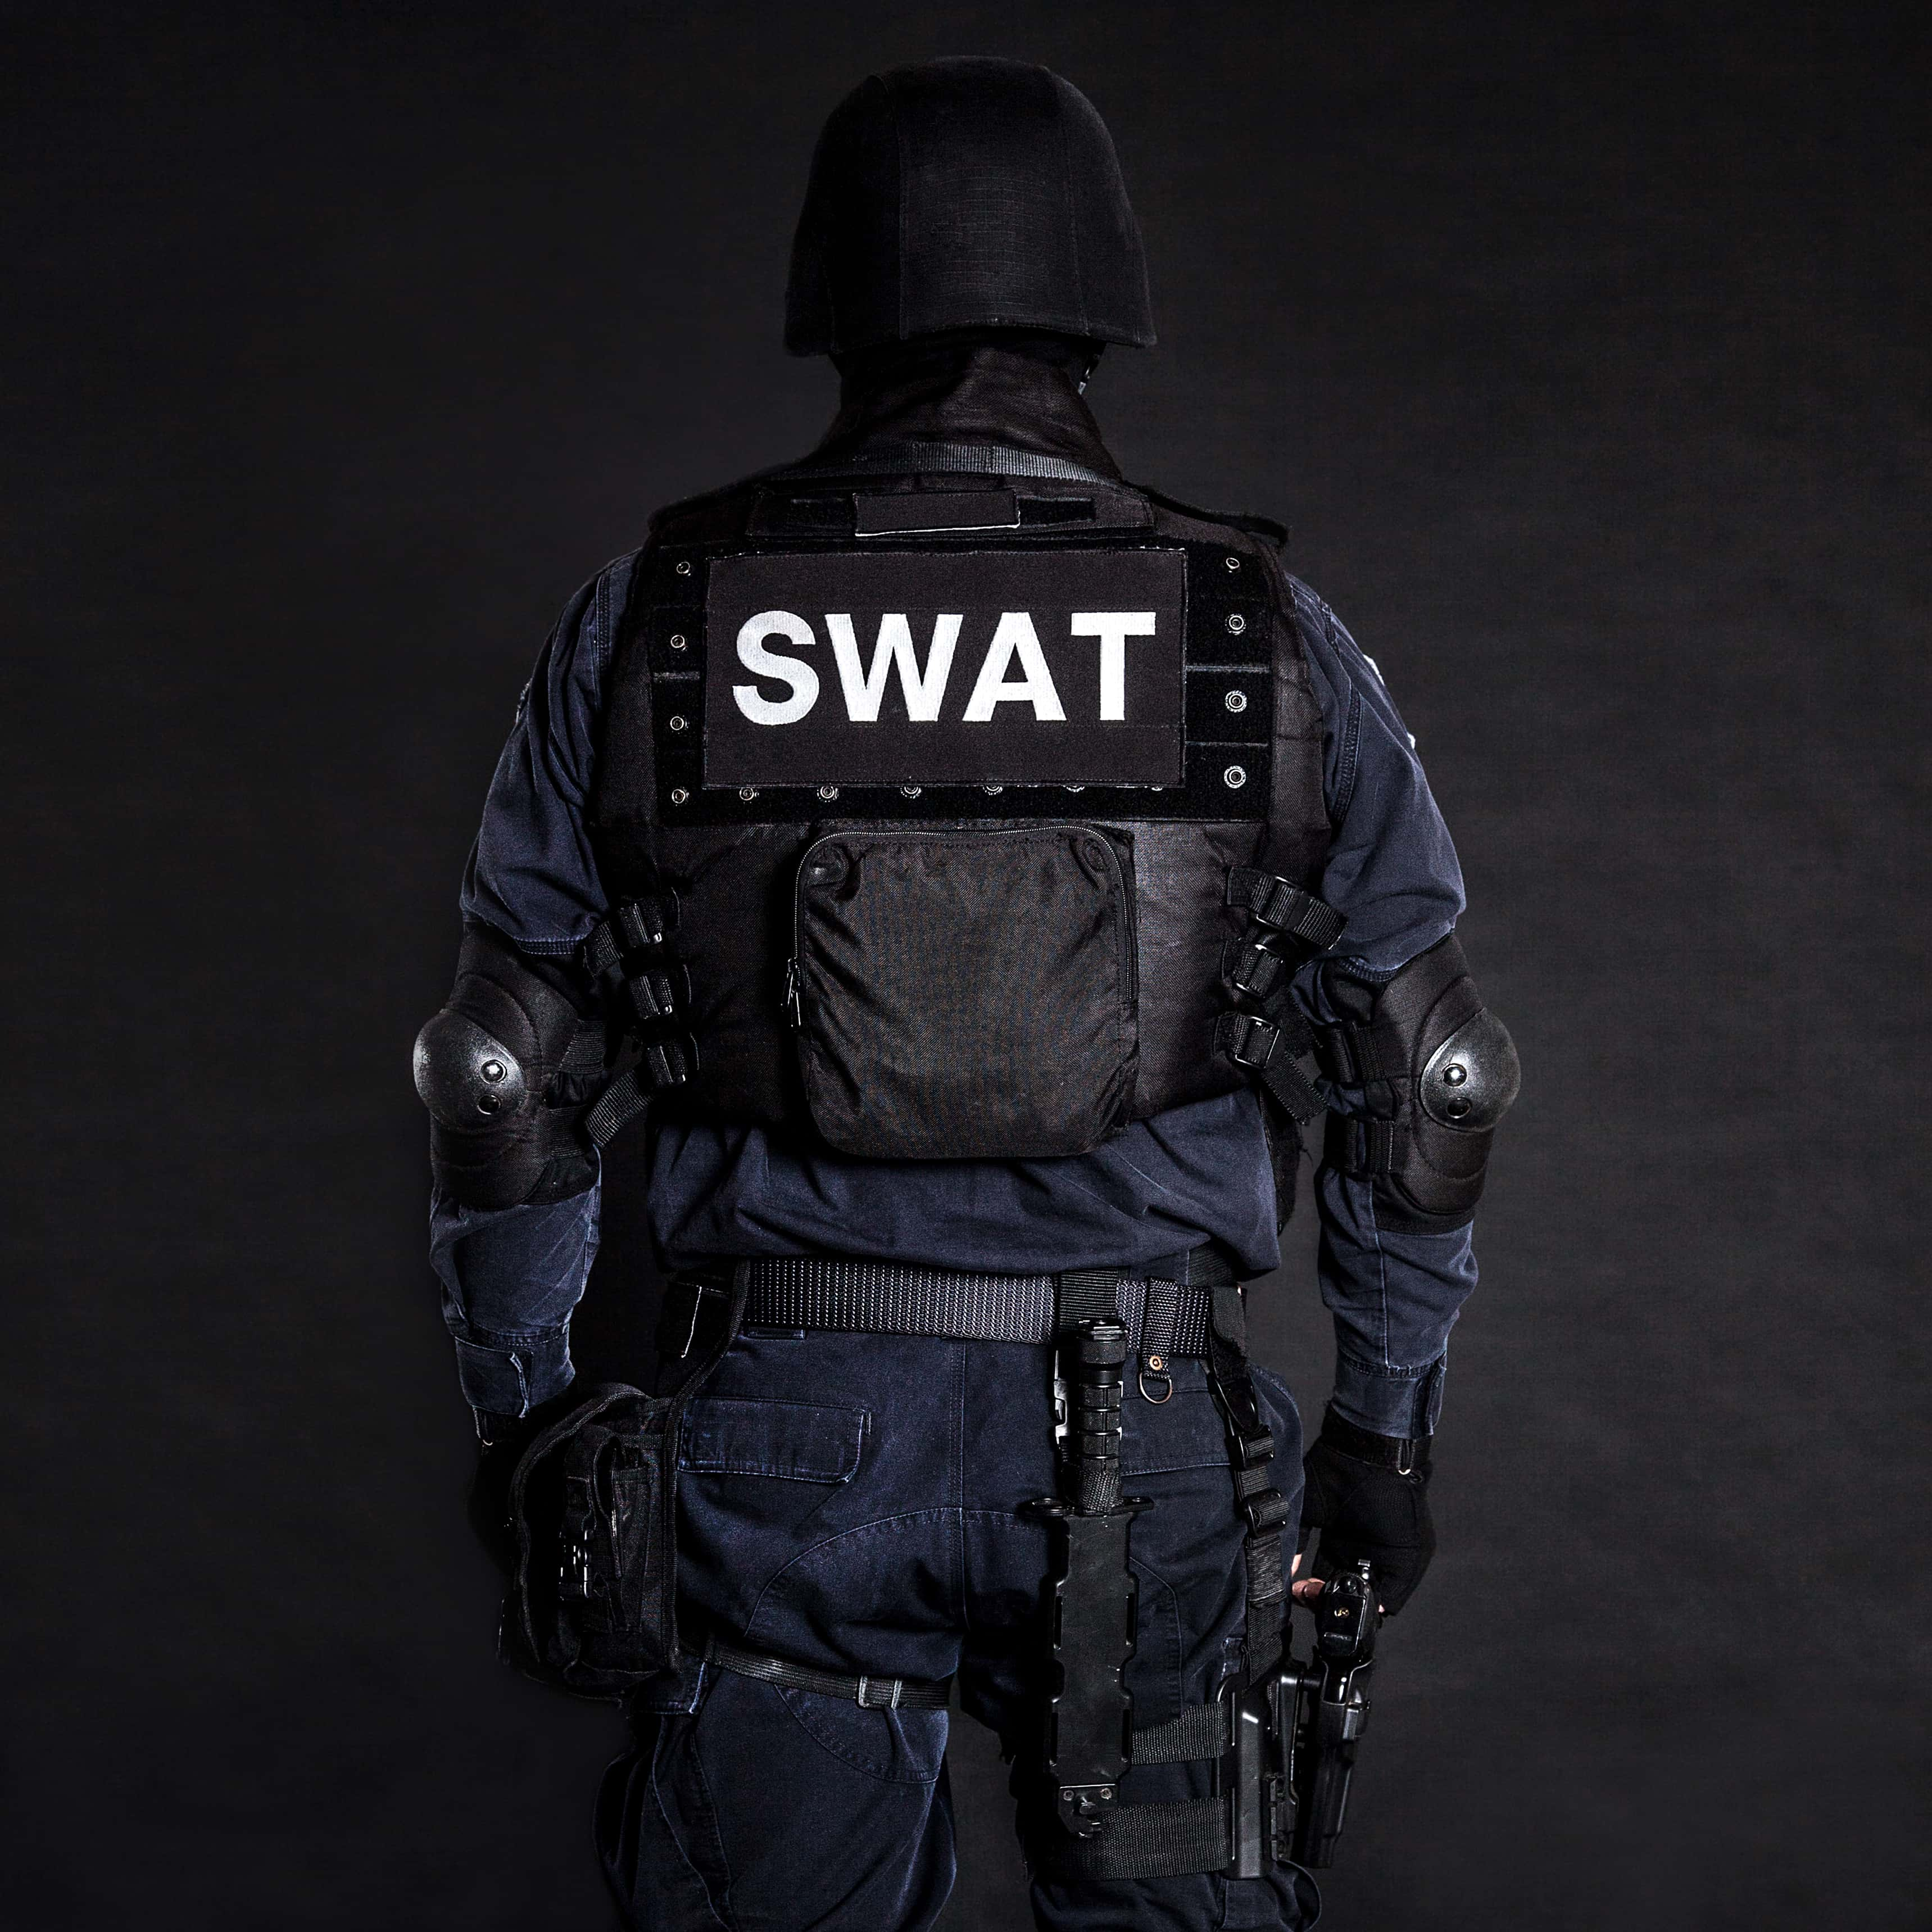 Southeast Austin SWAT standoff ends in arrest